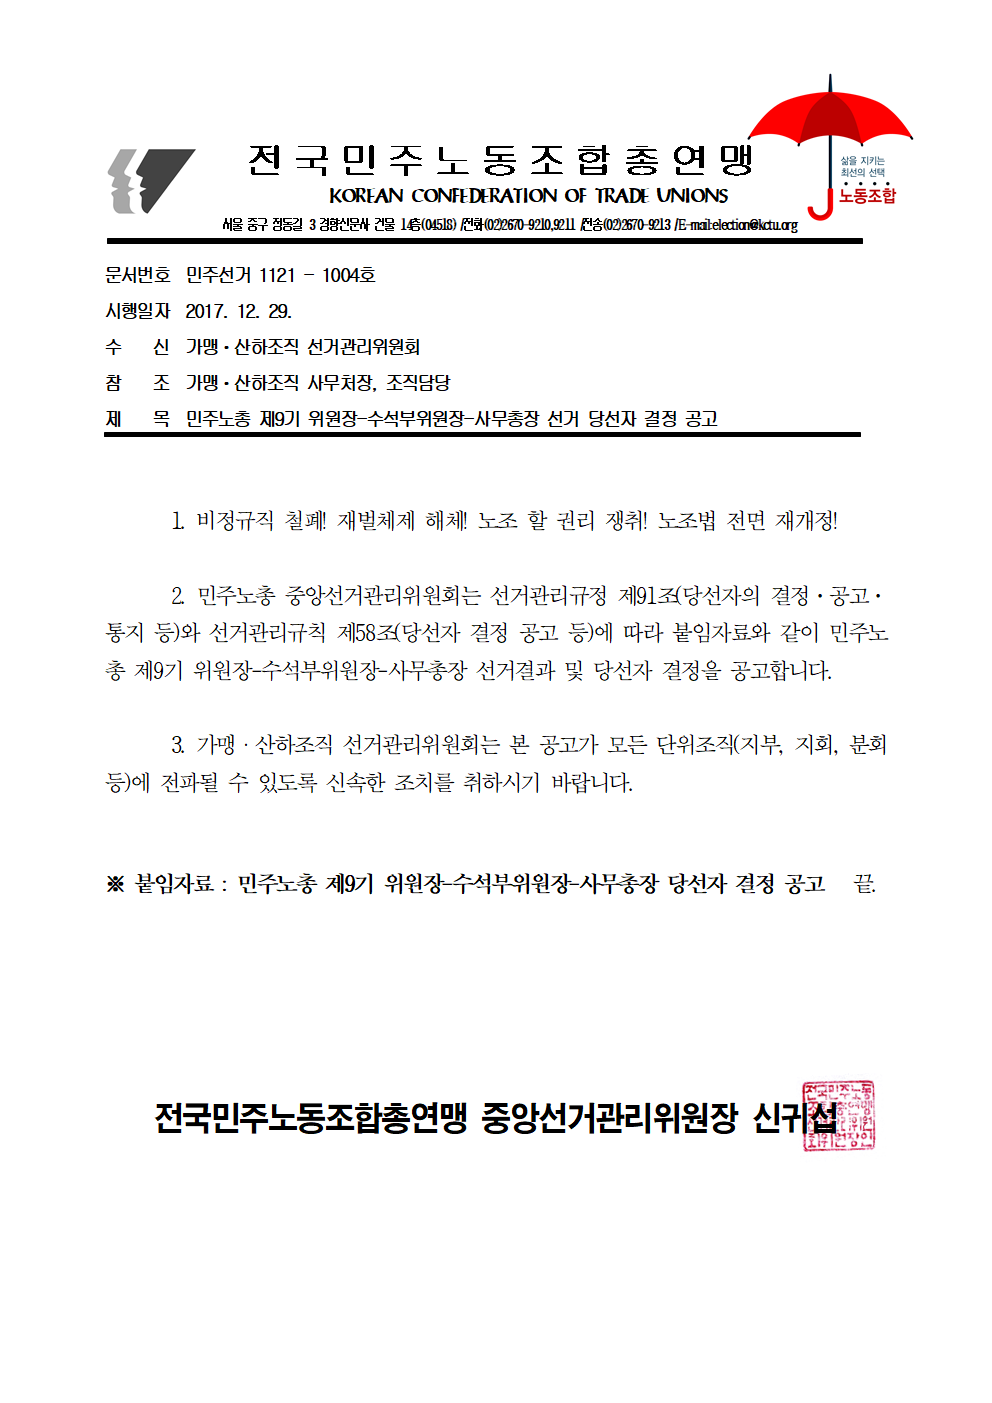 17kctu1004_민주노총 제9기 위원장-수석부위원장-사무총장 선거 당선자 결정 공고001.png